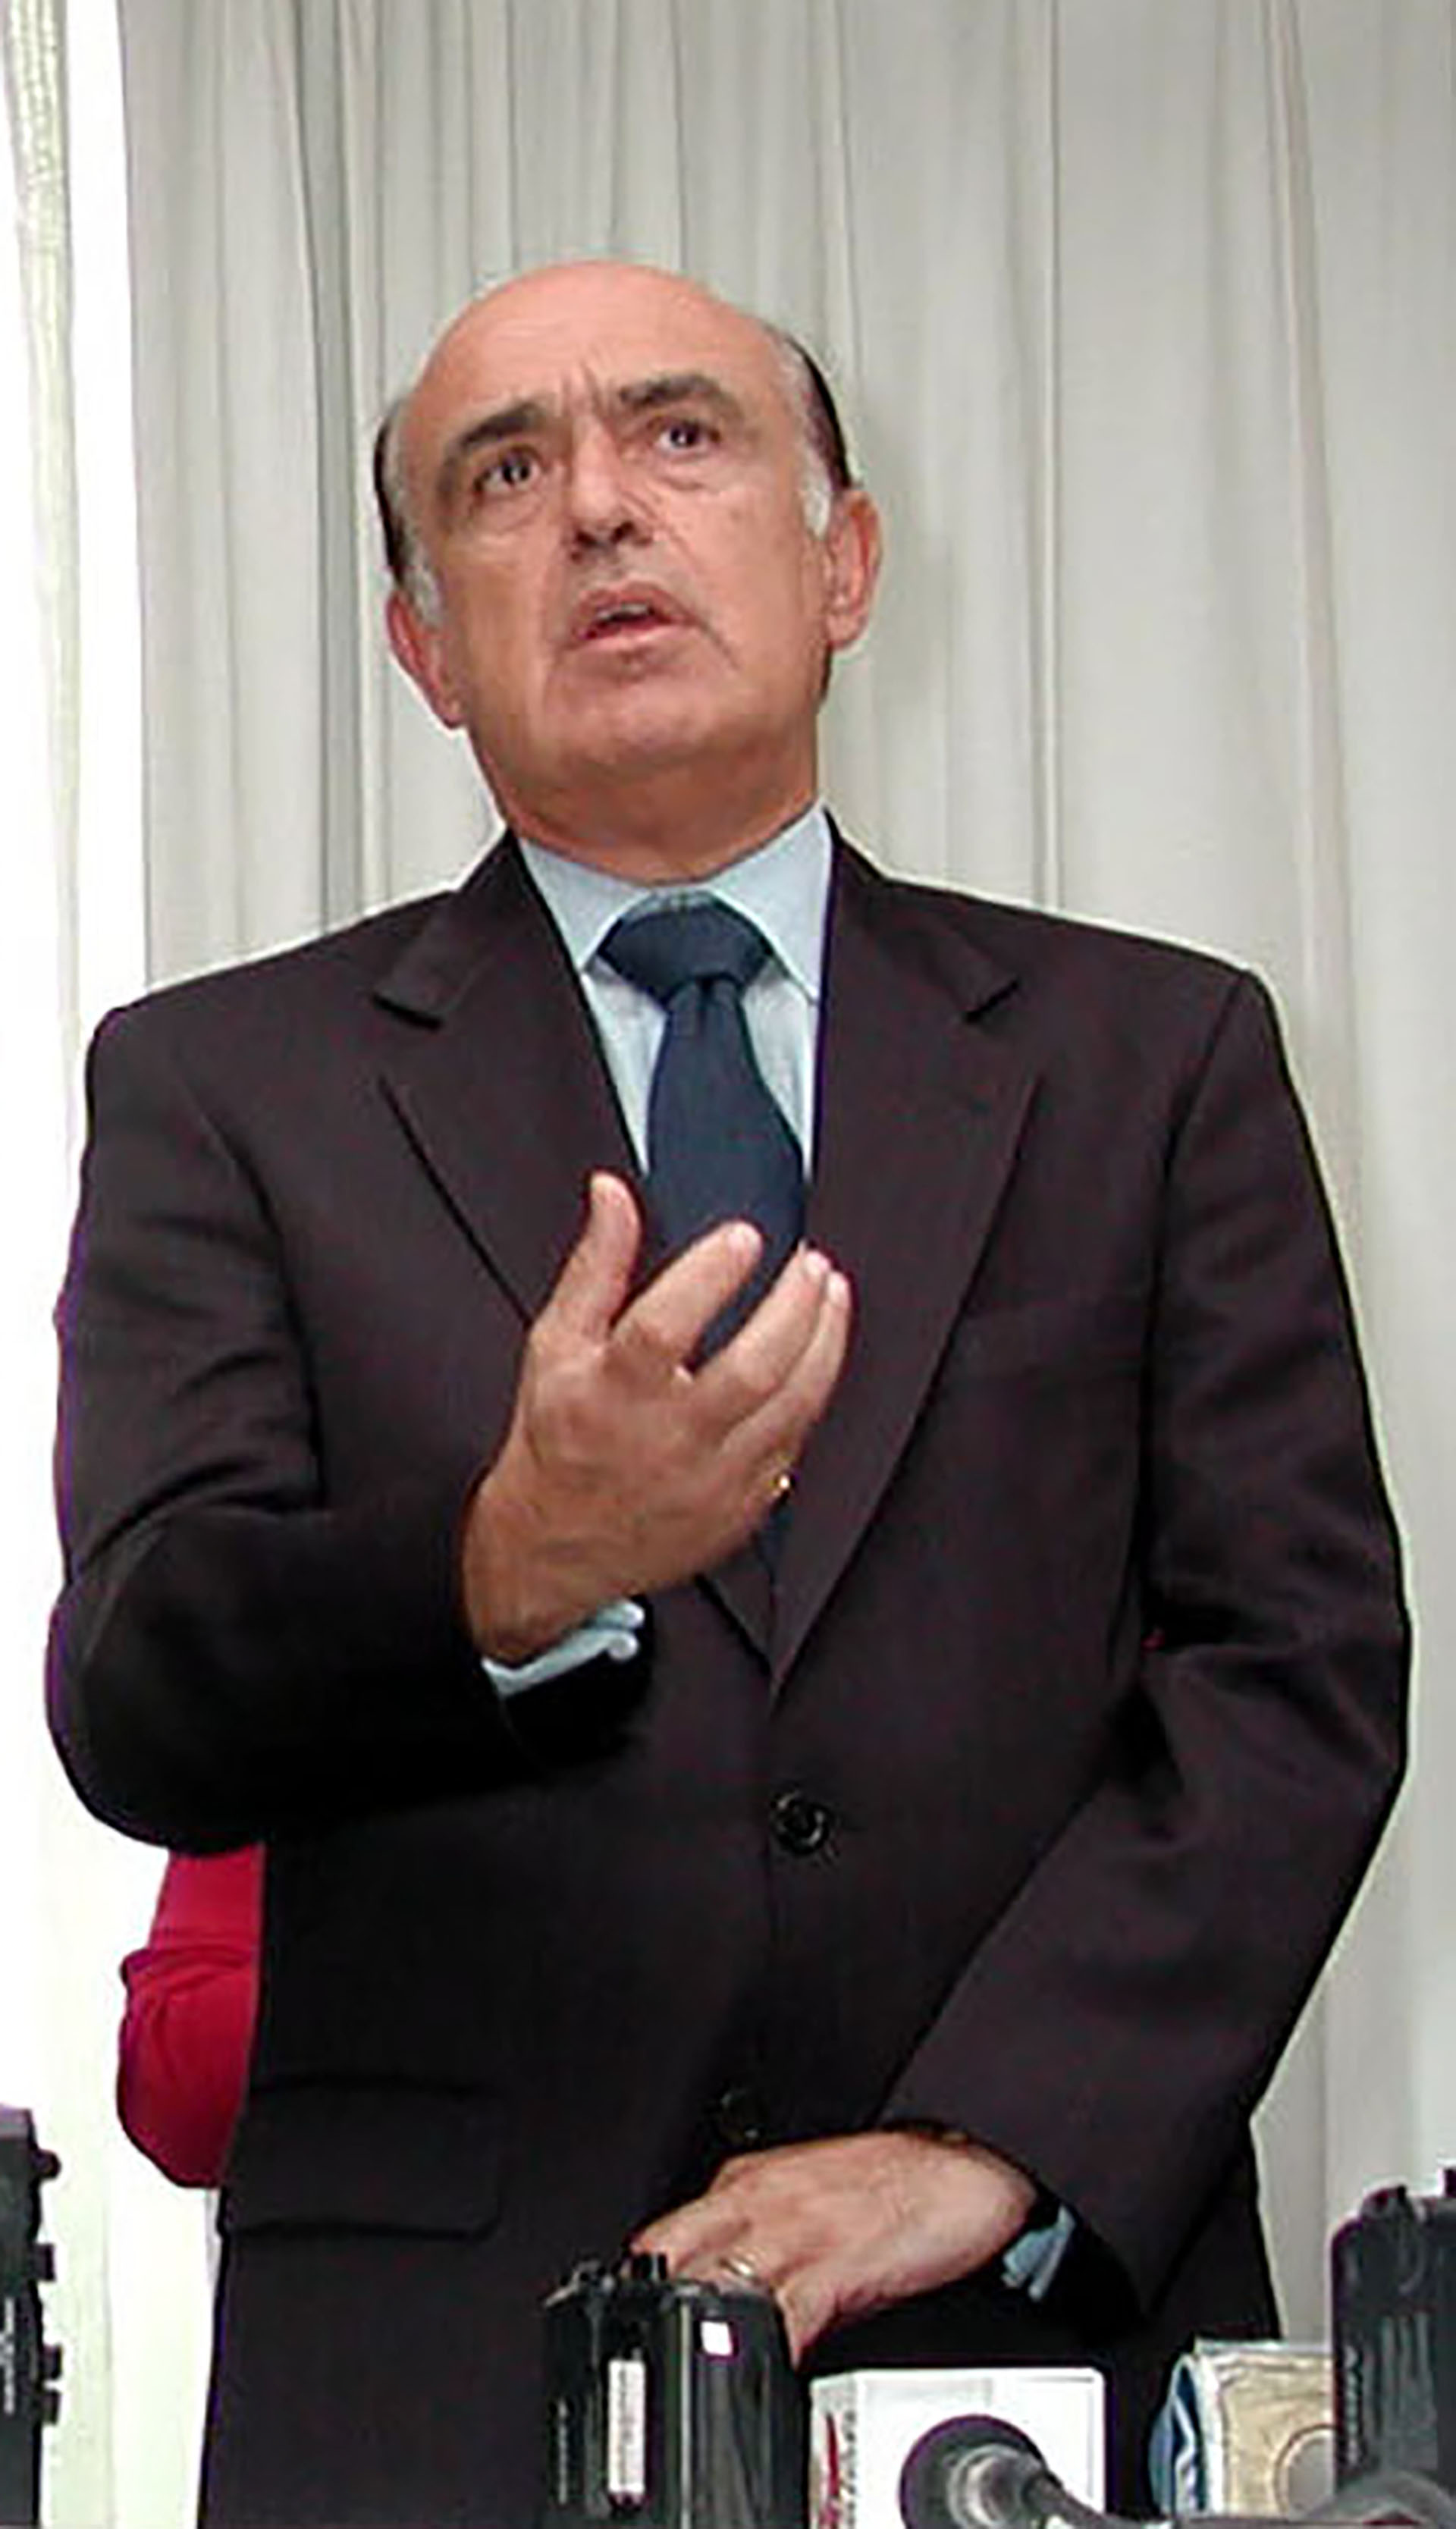 Carlos Ruckauf